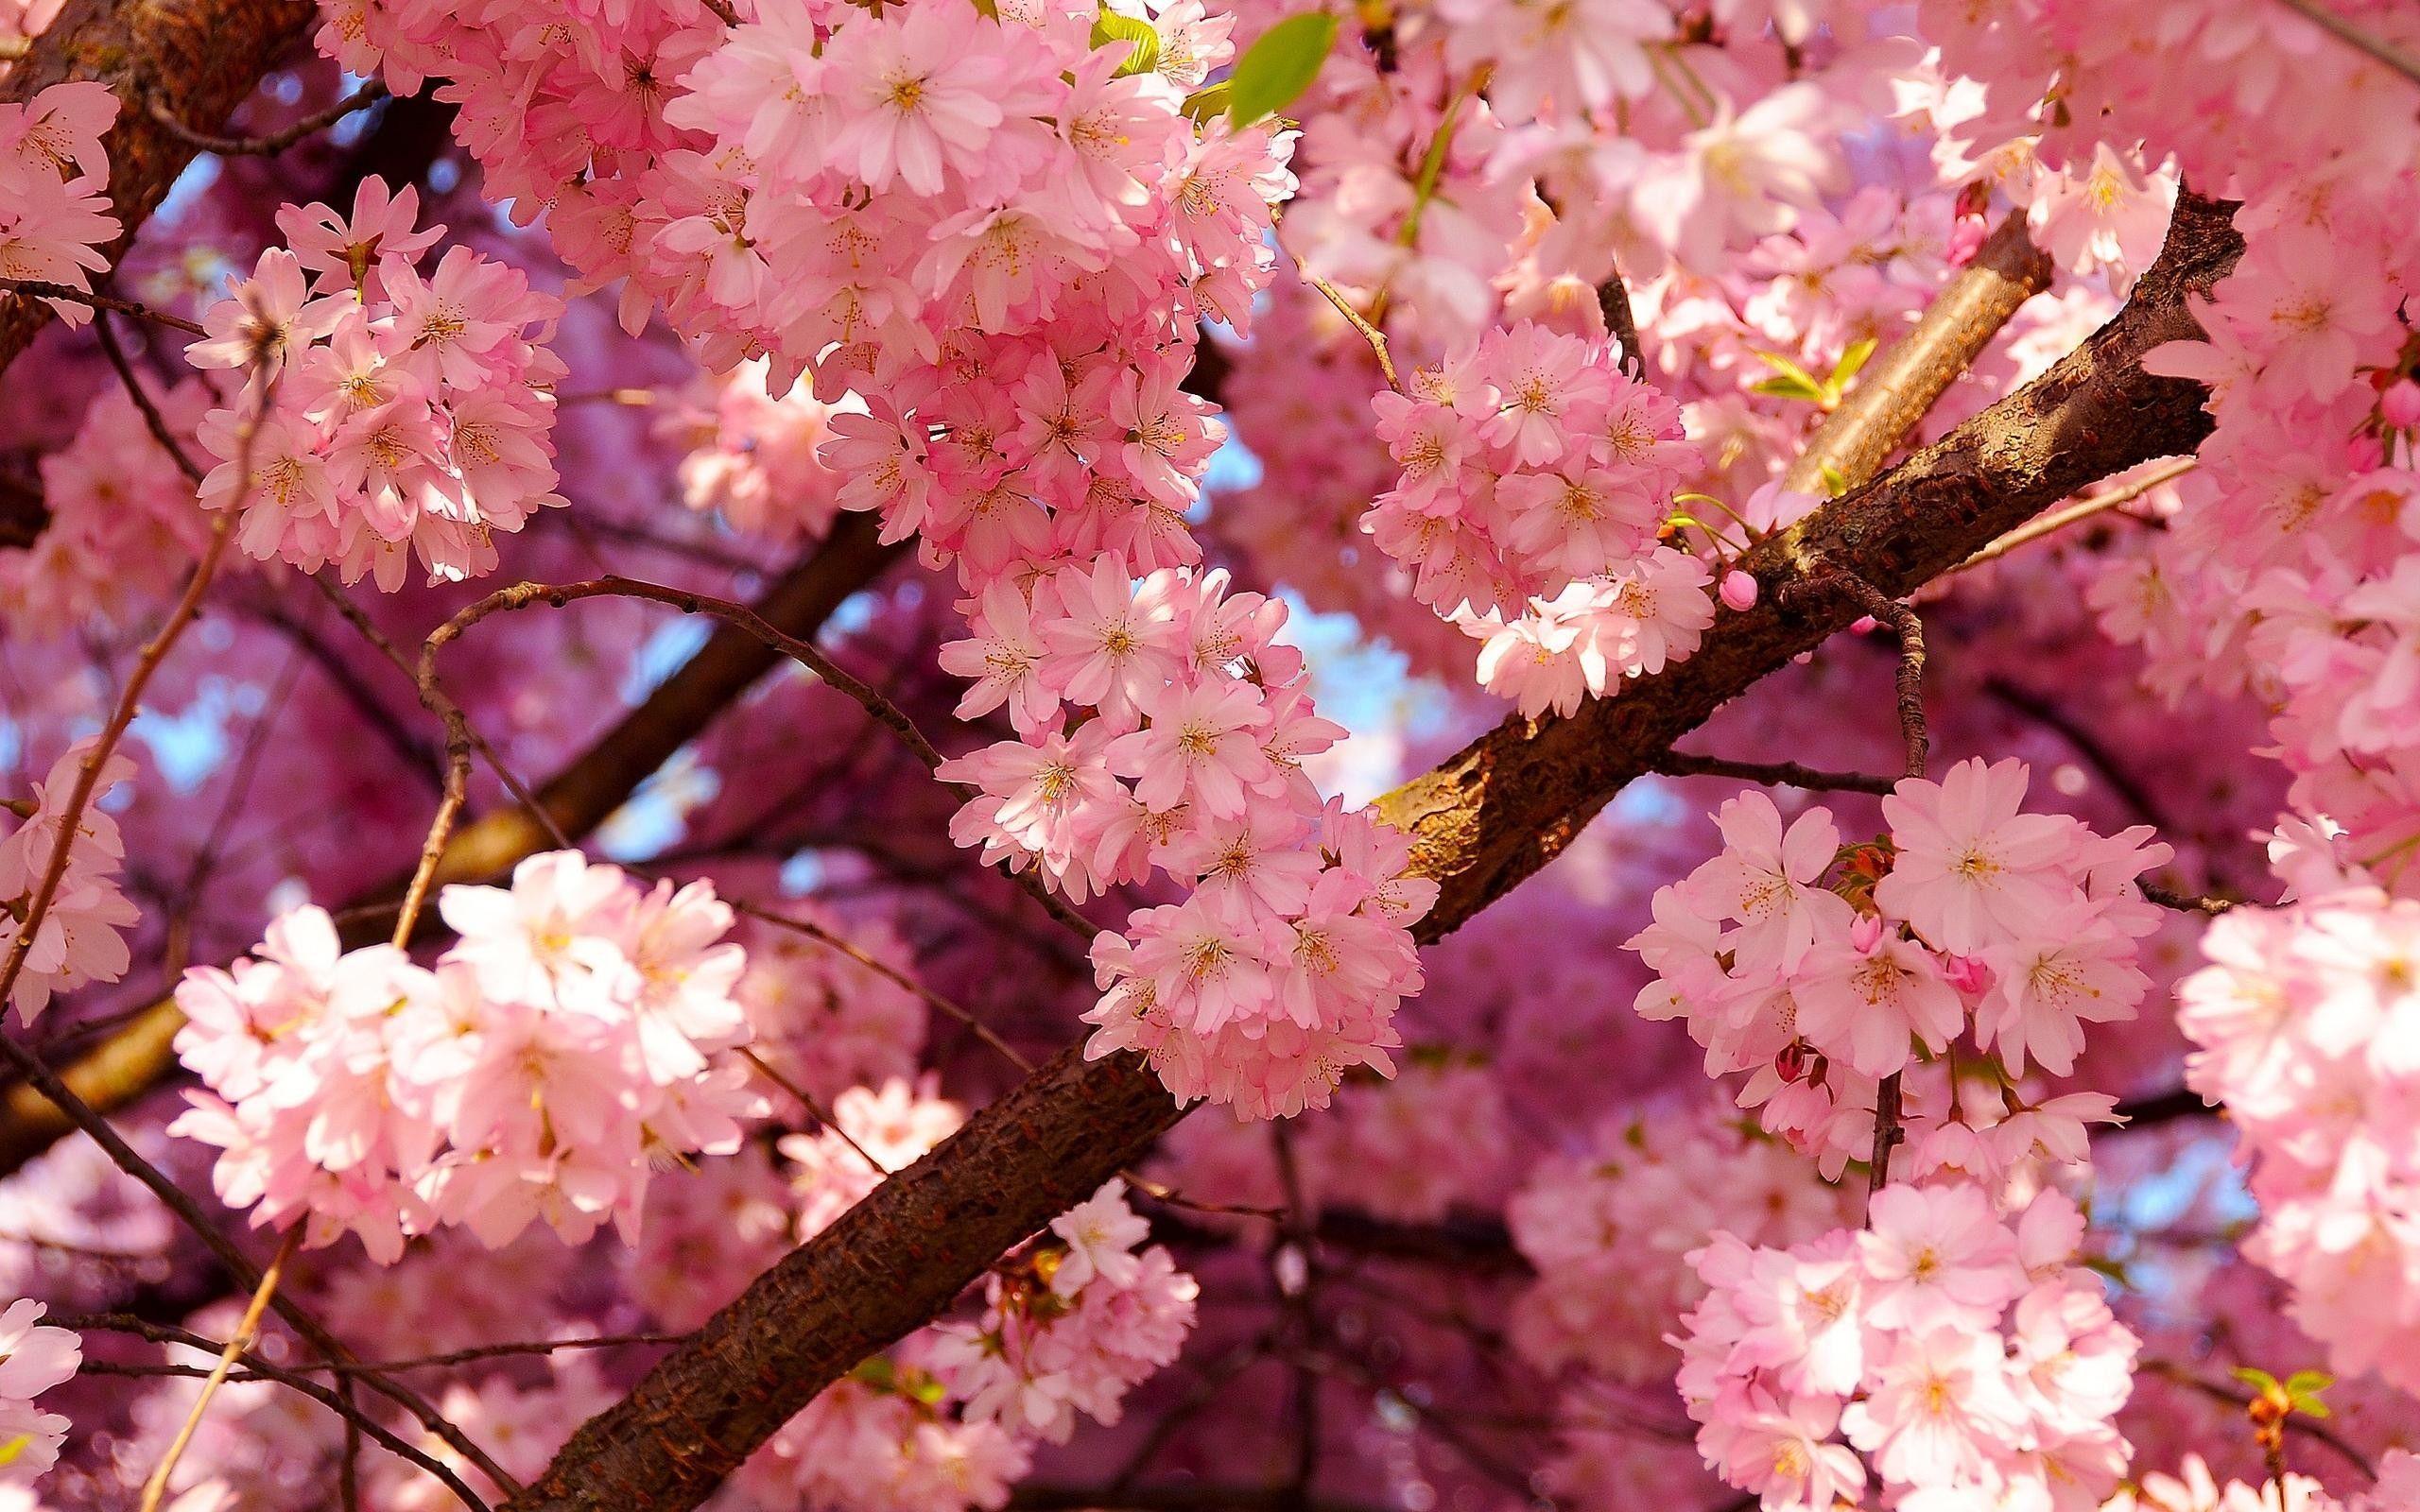 Pink Cherry Blossom Desktop Wallpapers - Top Free Pink ...